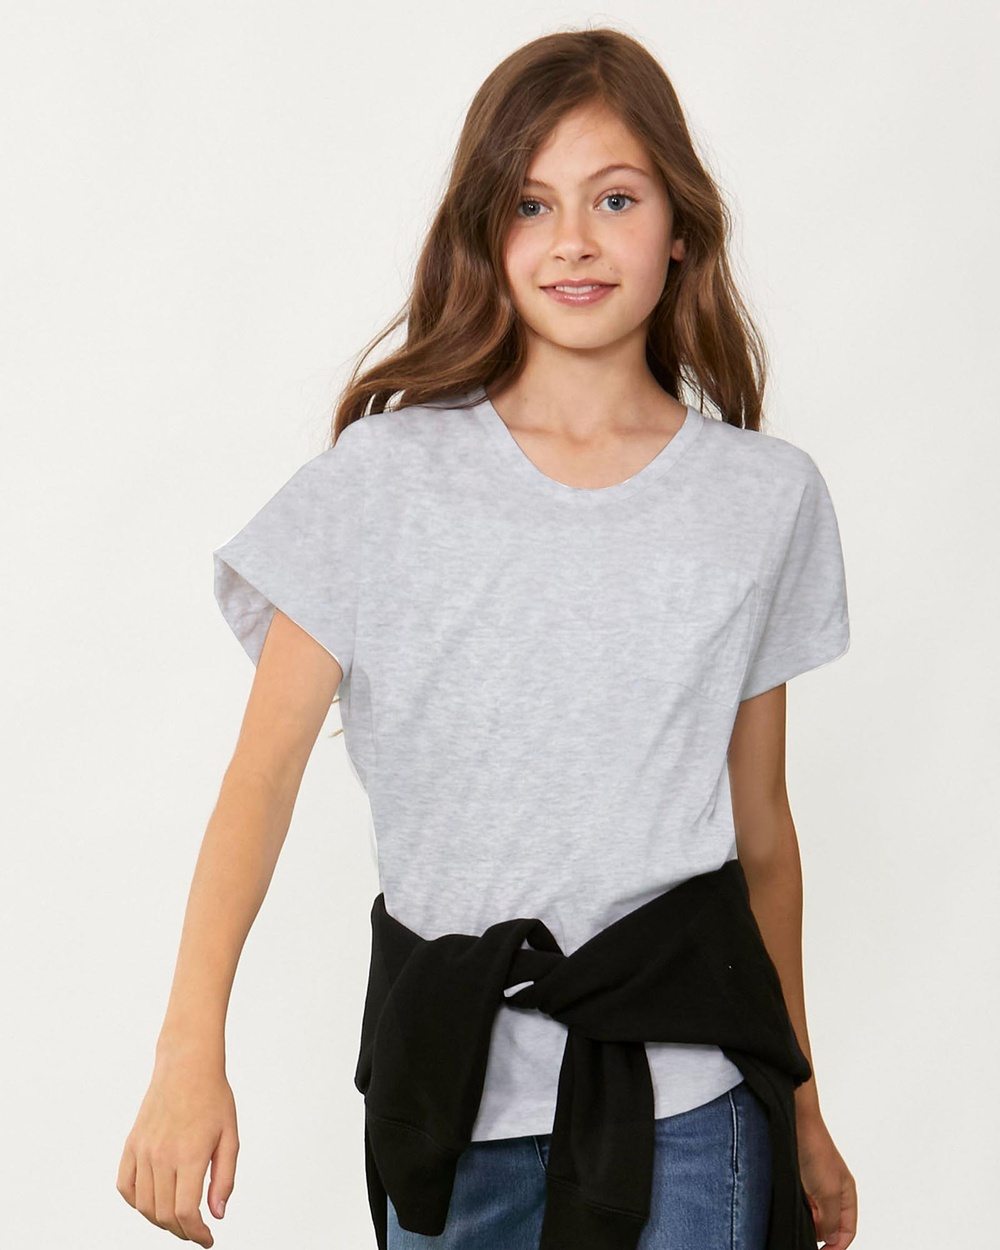 Decjuba Kids - Slouch Tee   Kids Teens - T-Shirts & Singlets (Shadow Grey Marle) Slouch Tee - Kids-Teens